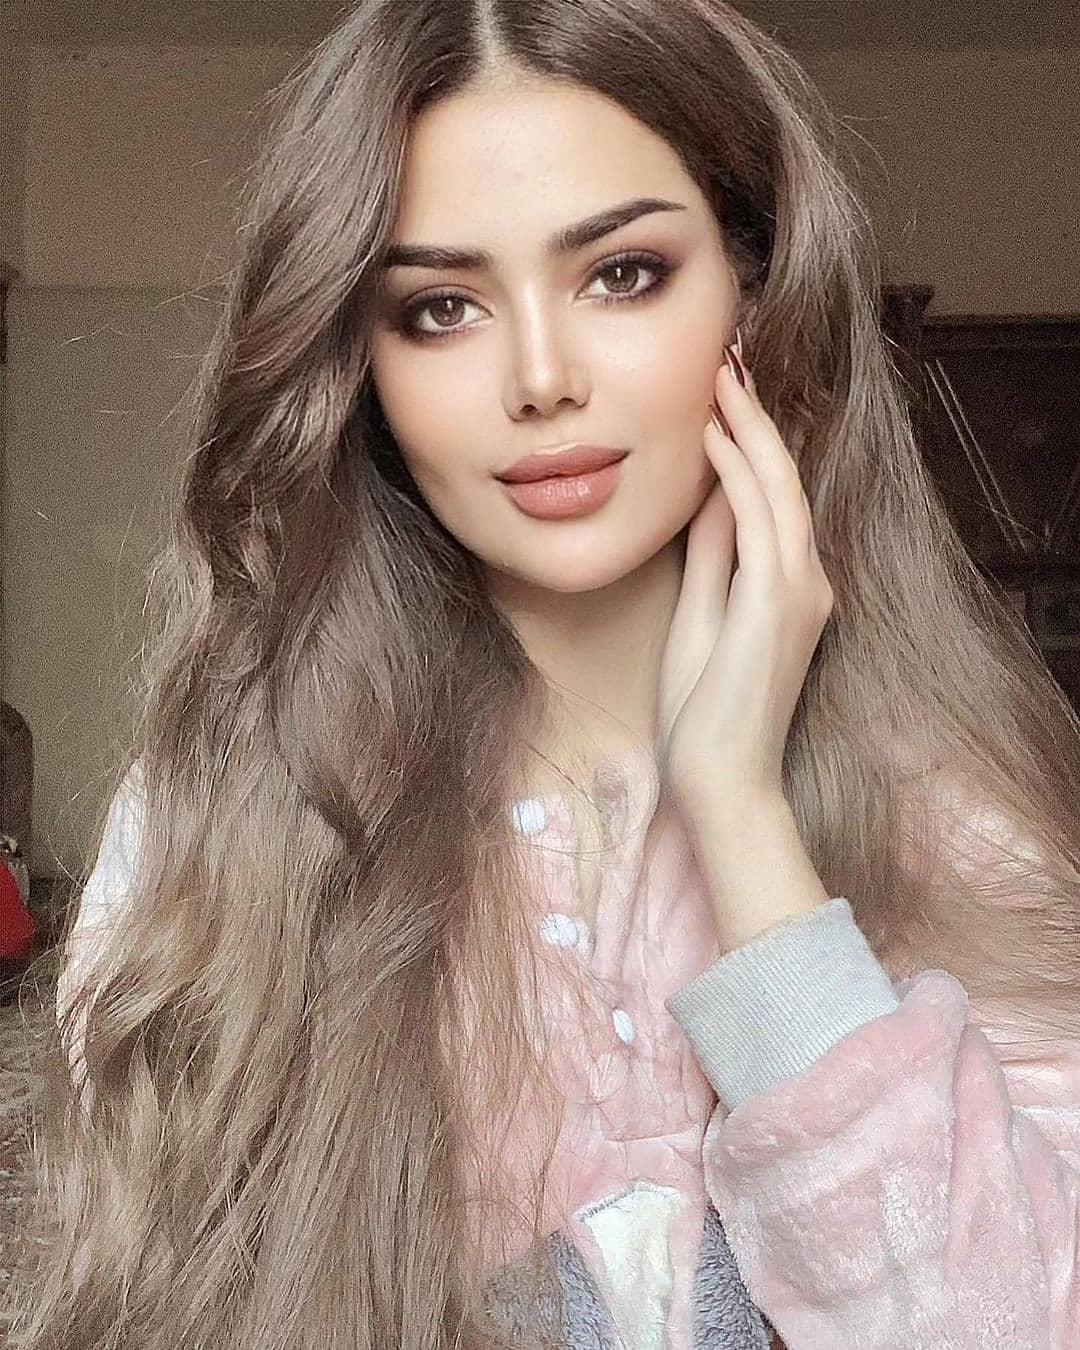 Beautiful Portrait Girl Face